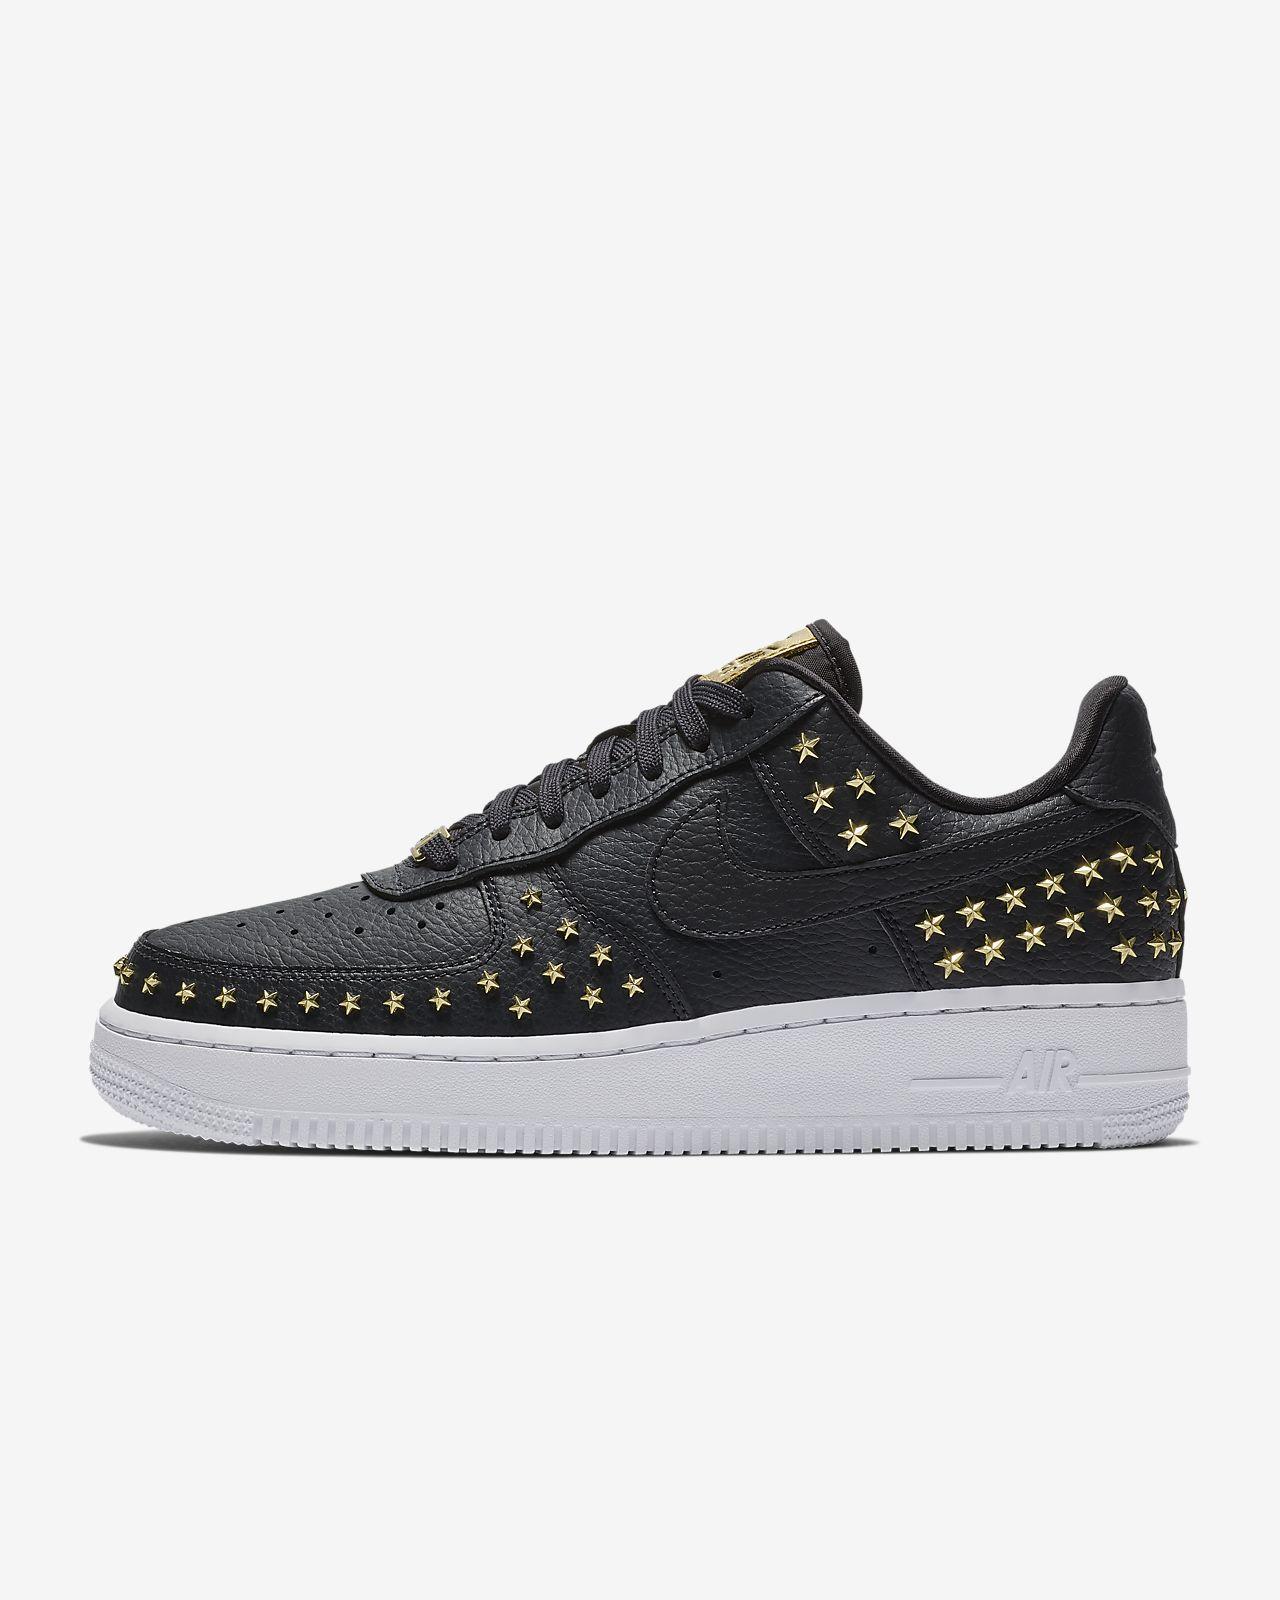 online retailer 39a02 0213f ... Calzado para mujer Nike Air Force 1  07 XX Studded